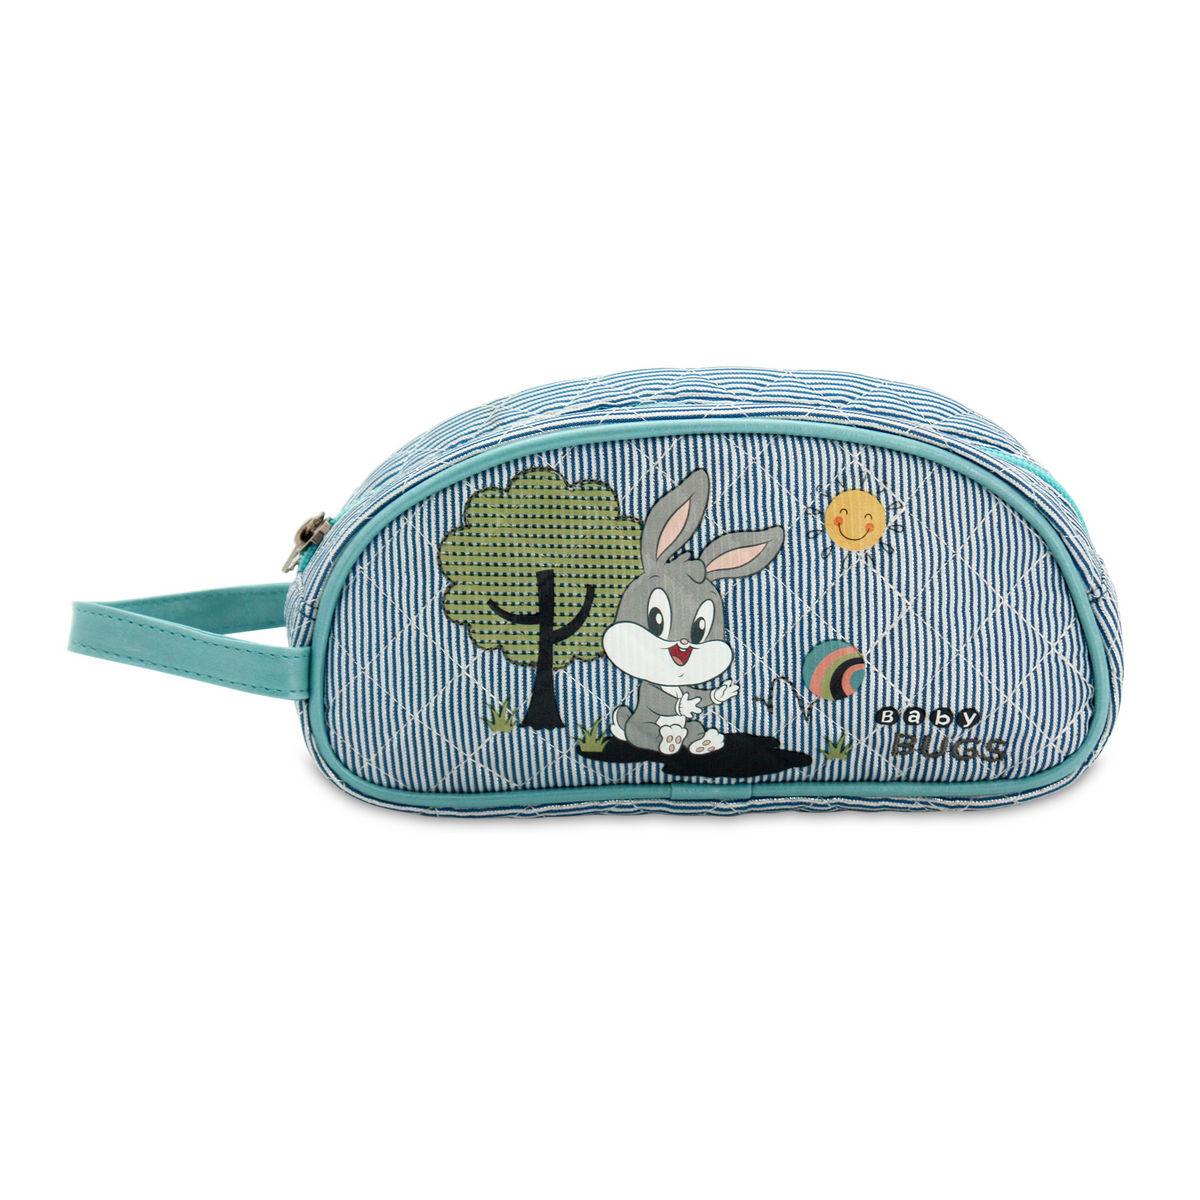 Neceser portatodo baby Looney Tunes azul